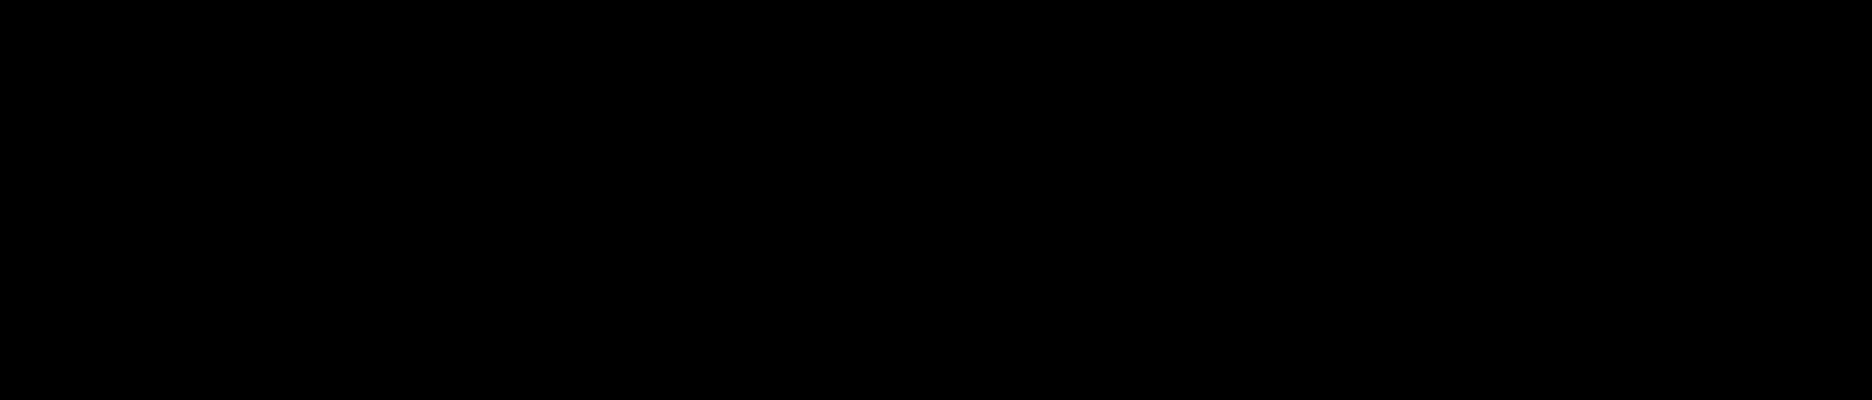 TENUNO